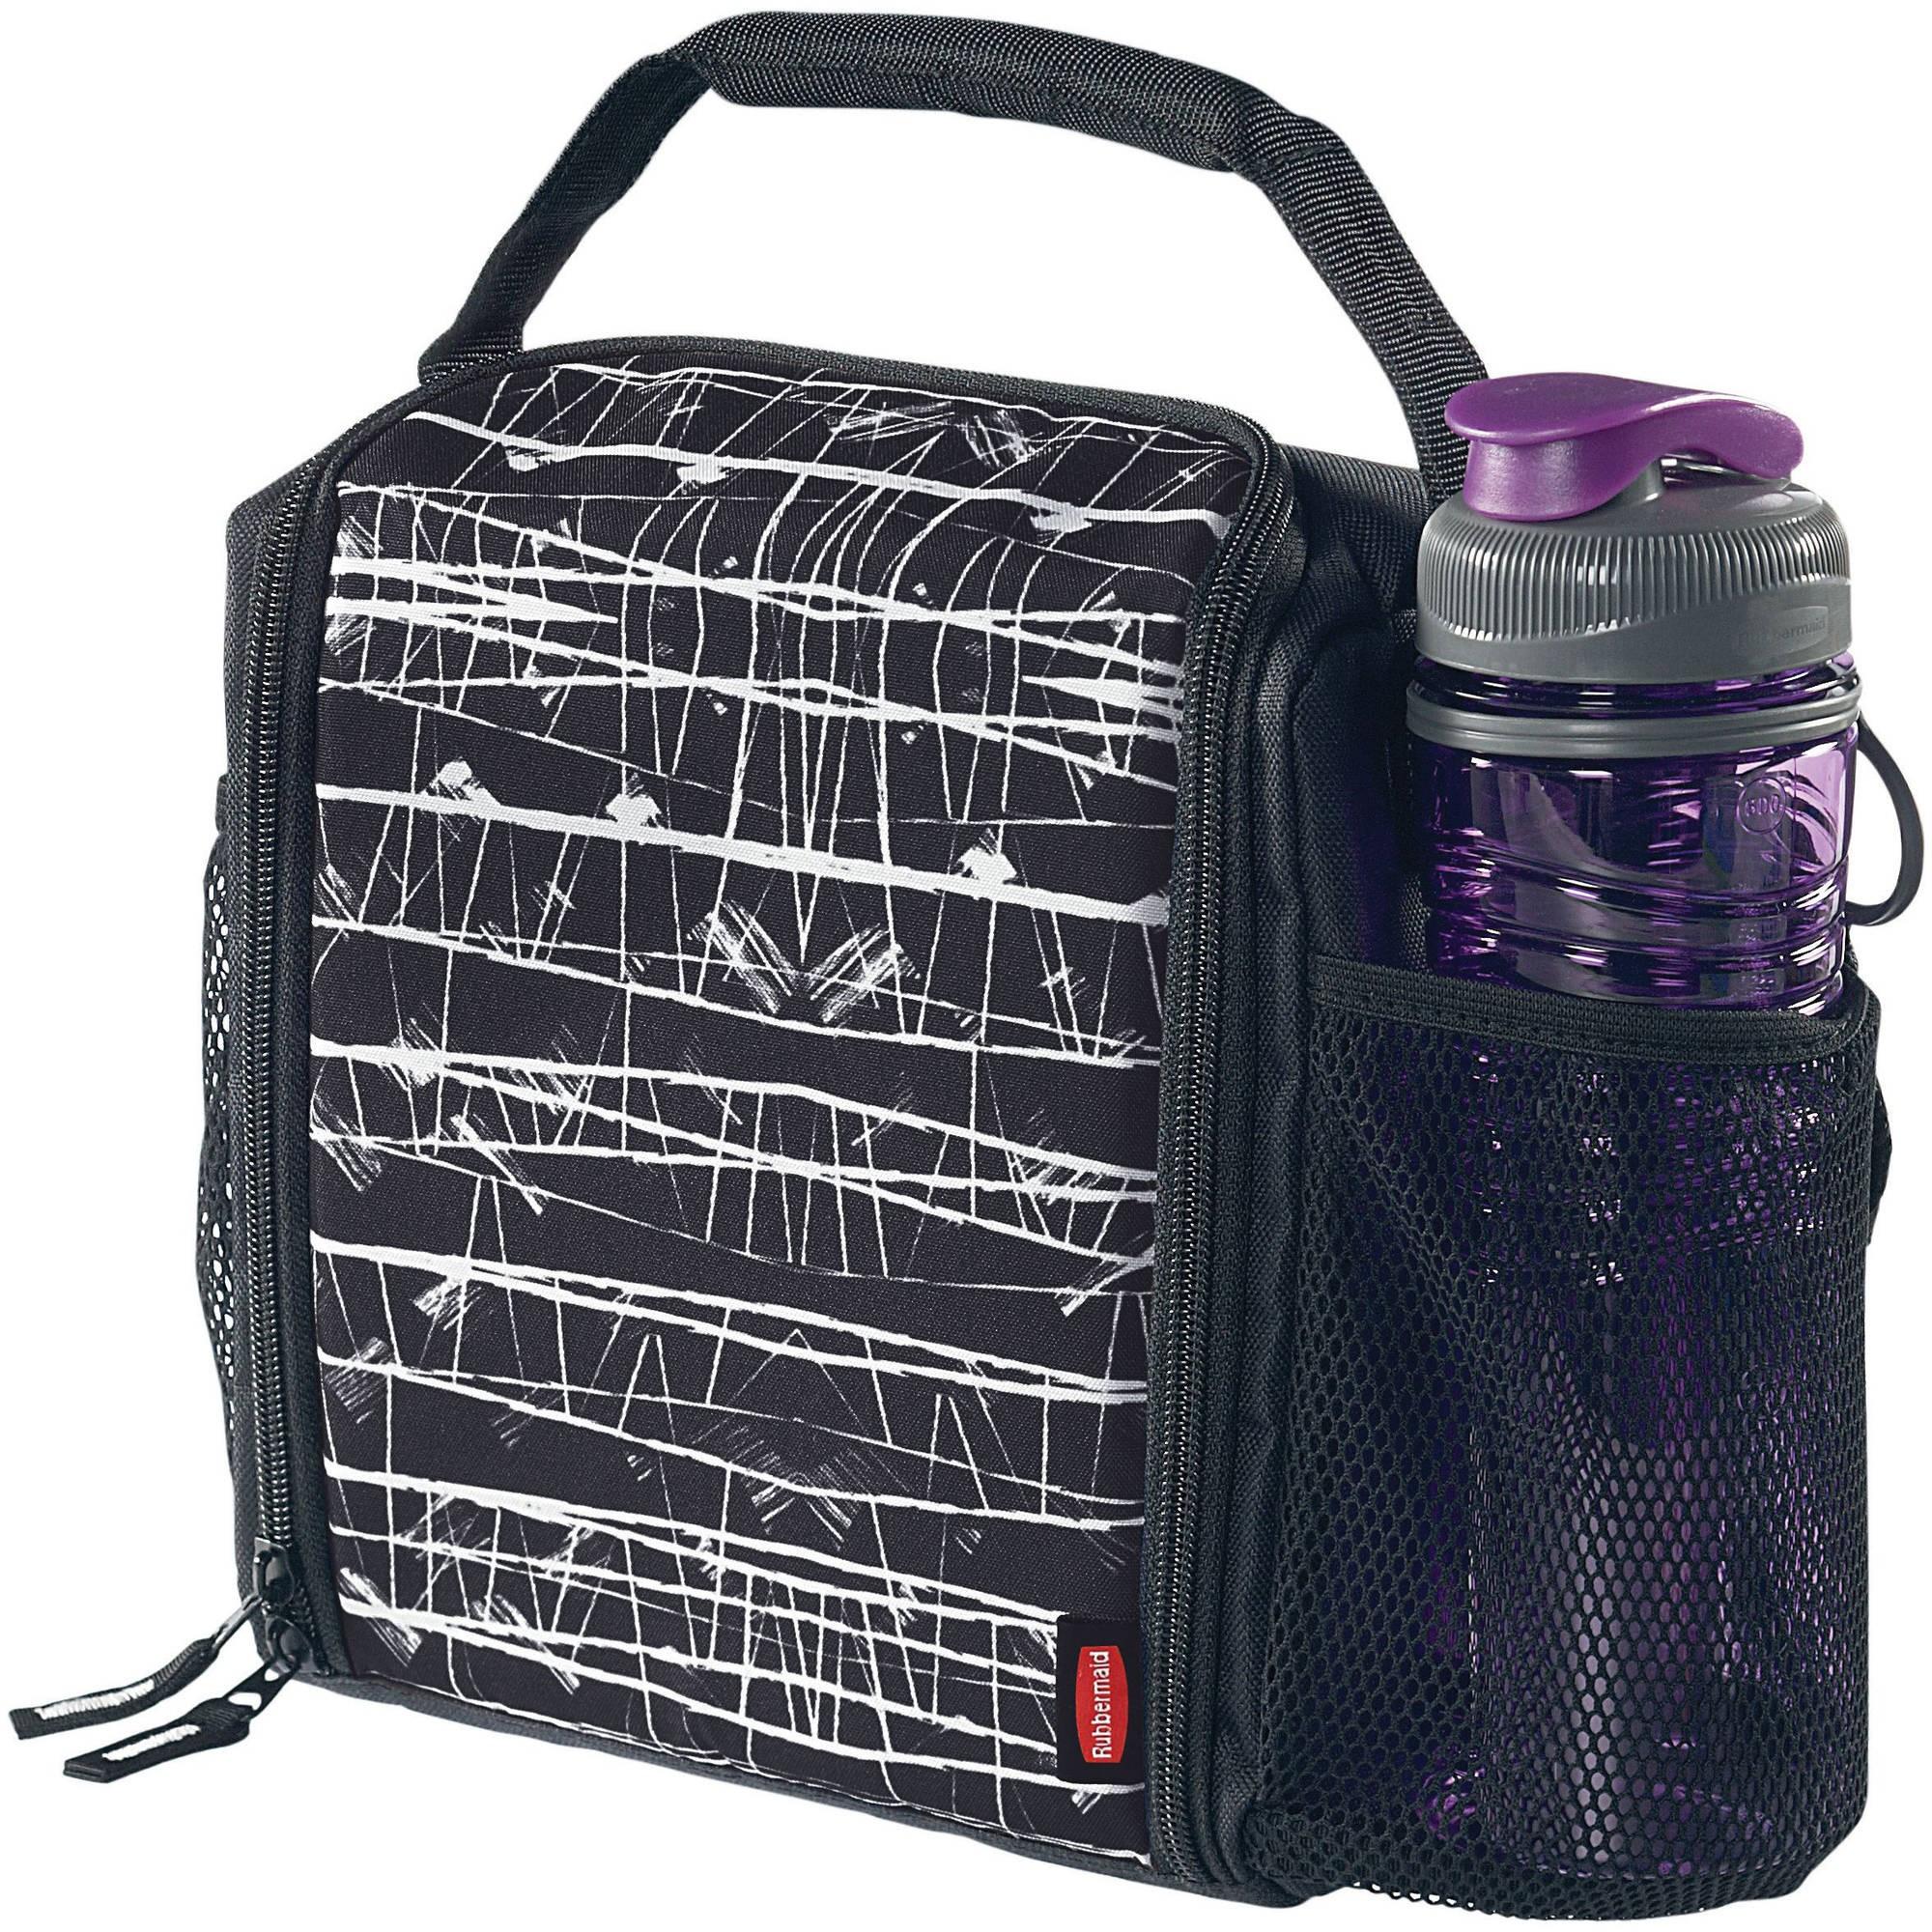 Rubbermaid LunchBlox Insulated Lunch Bag, Medium, Black Etch